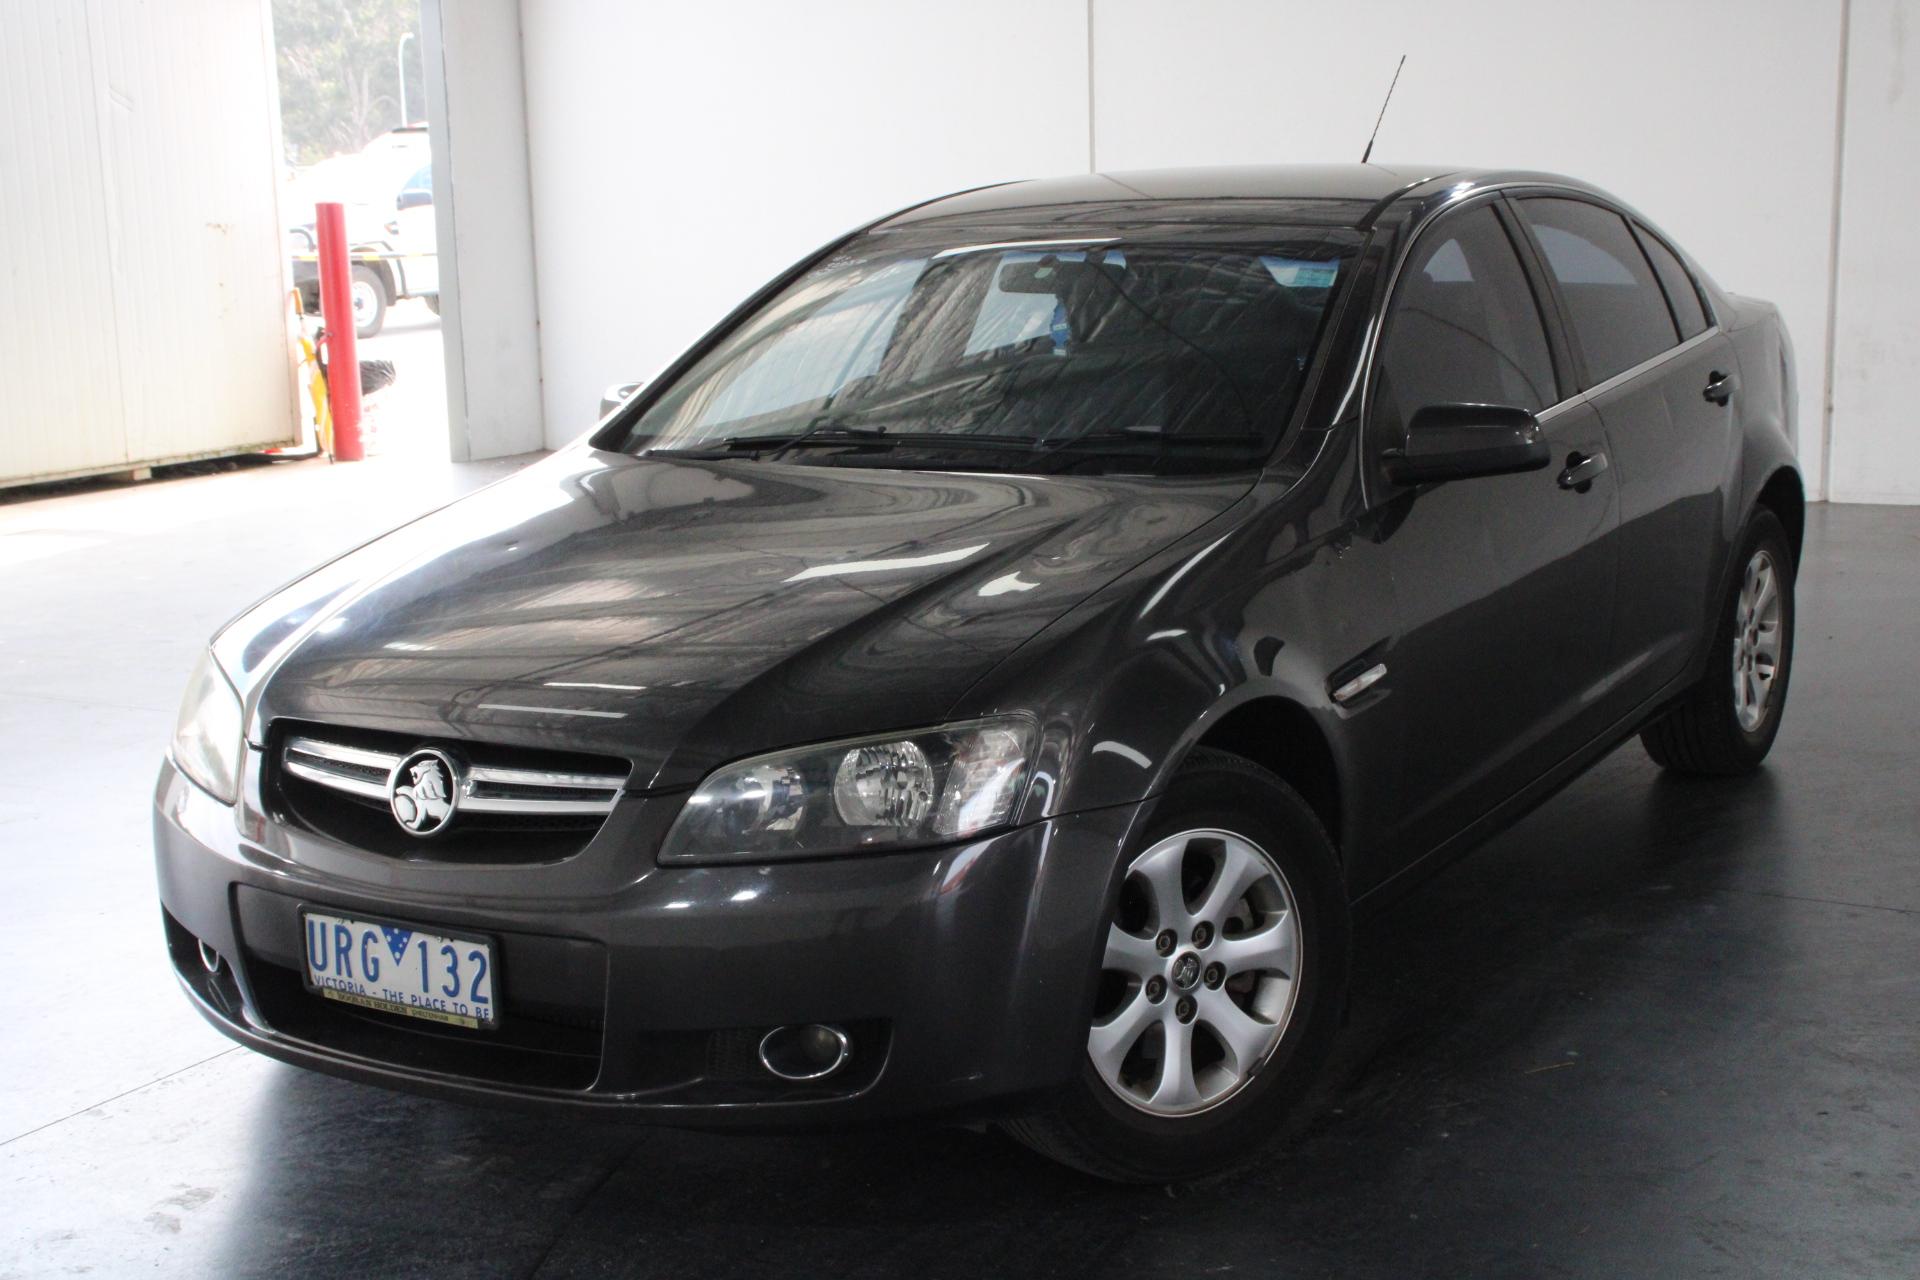 2007 Holden Berlina VE Automatic Sedan